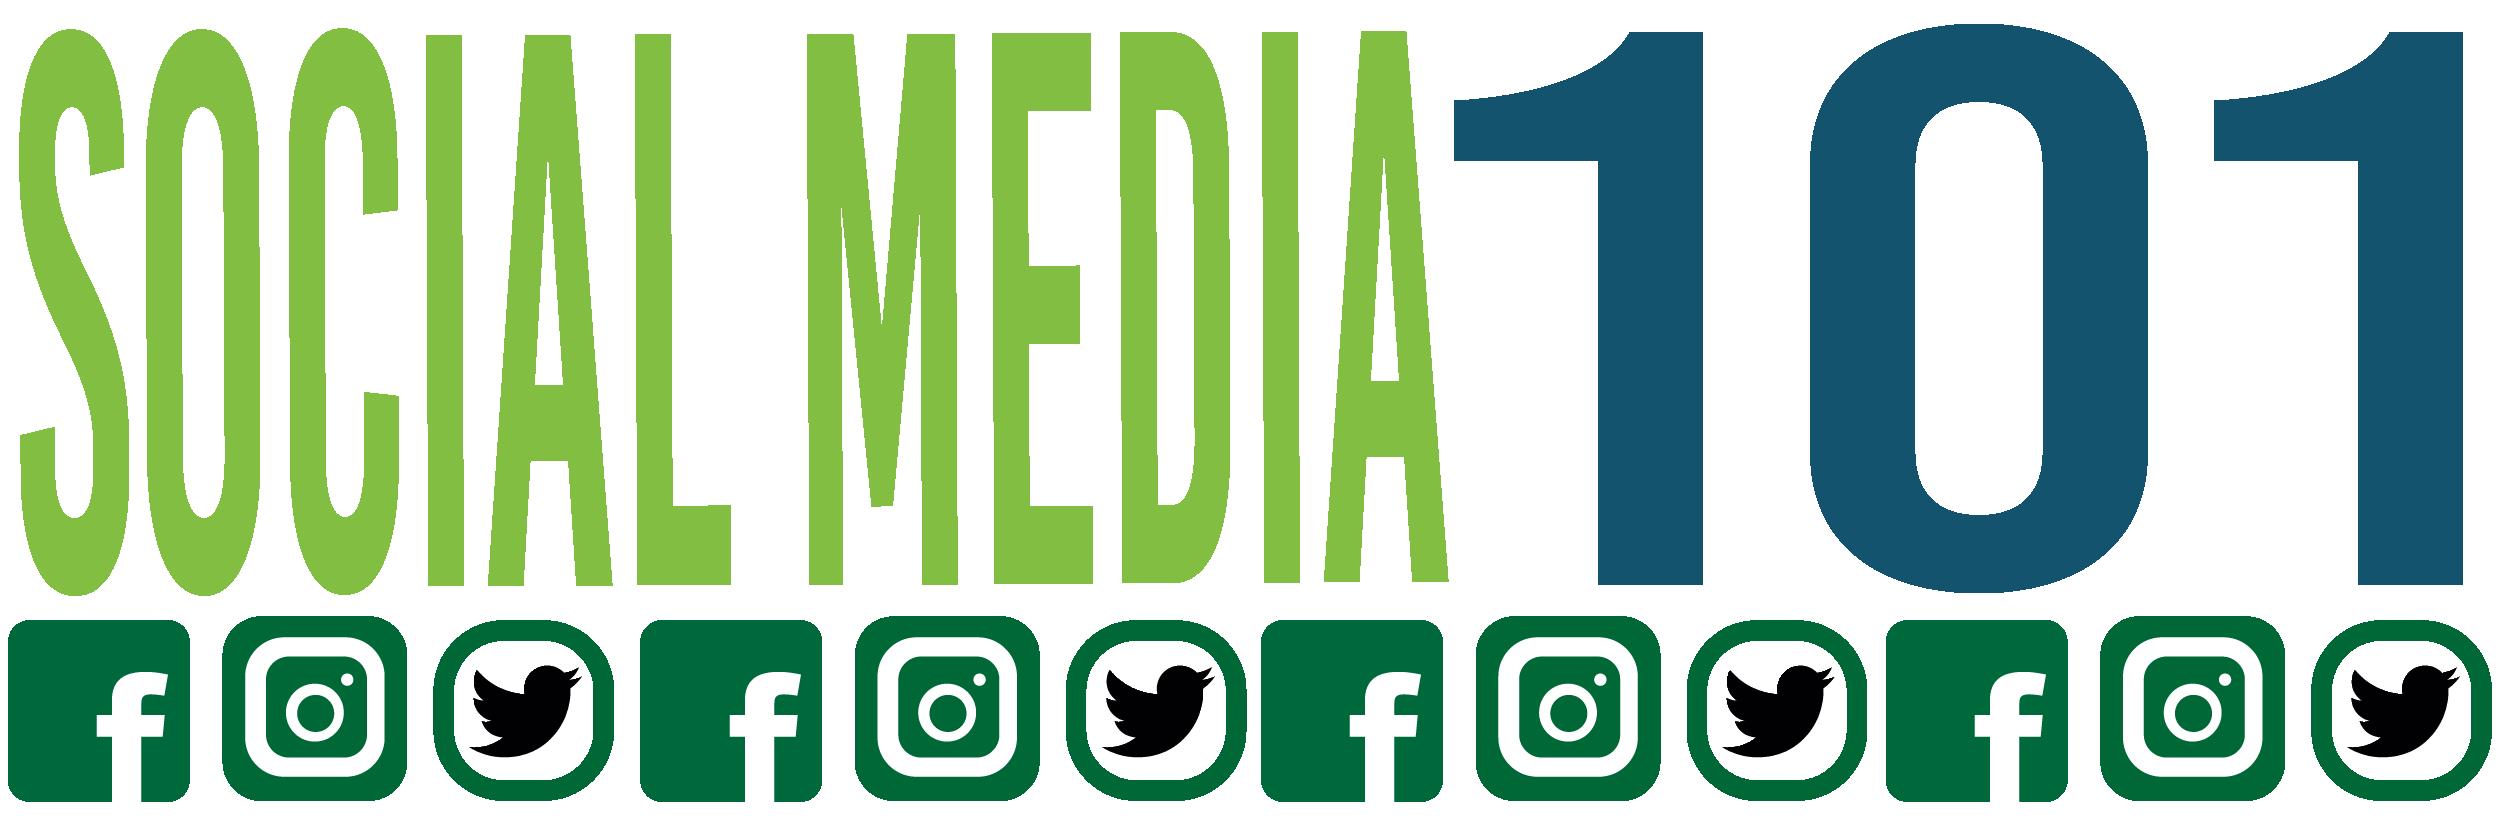 social-media-101-banner-01.png